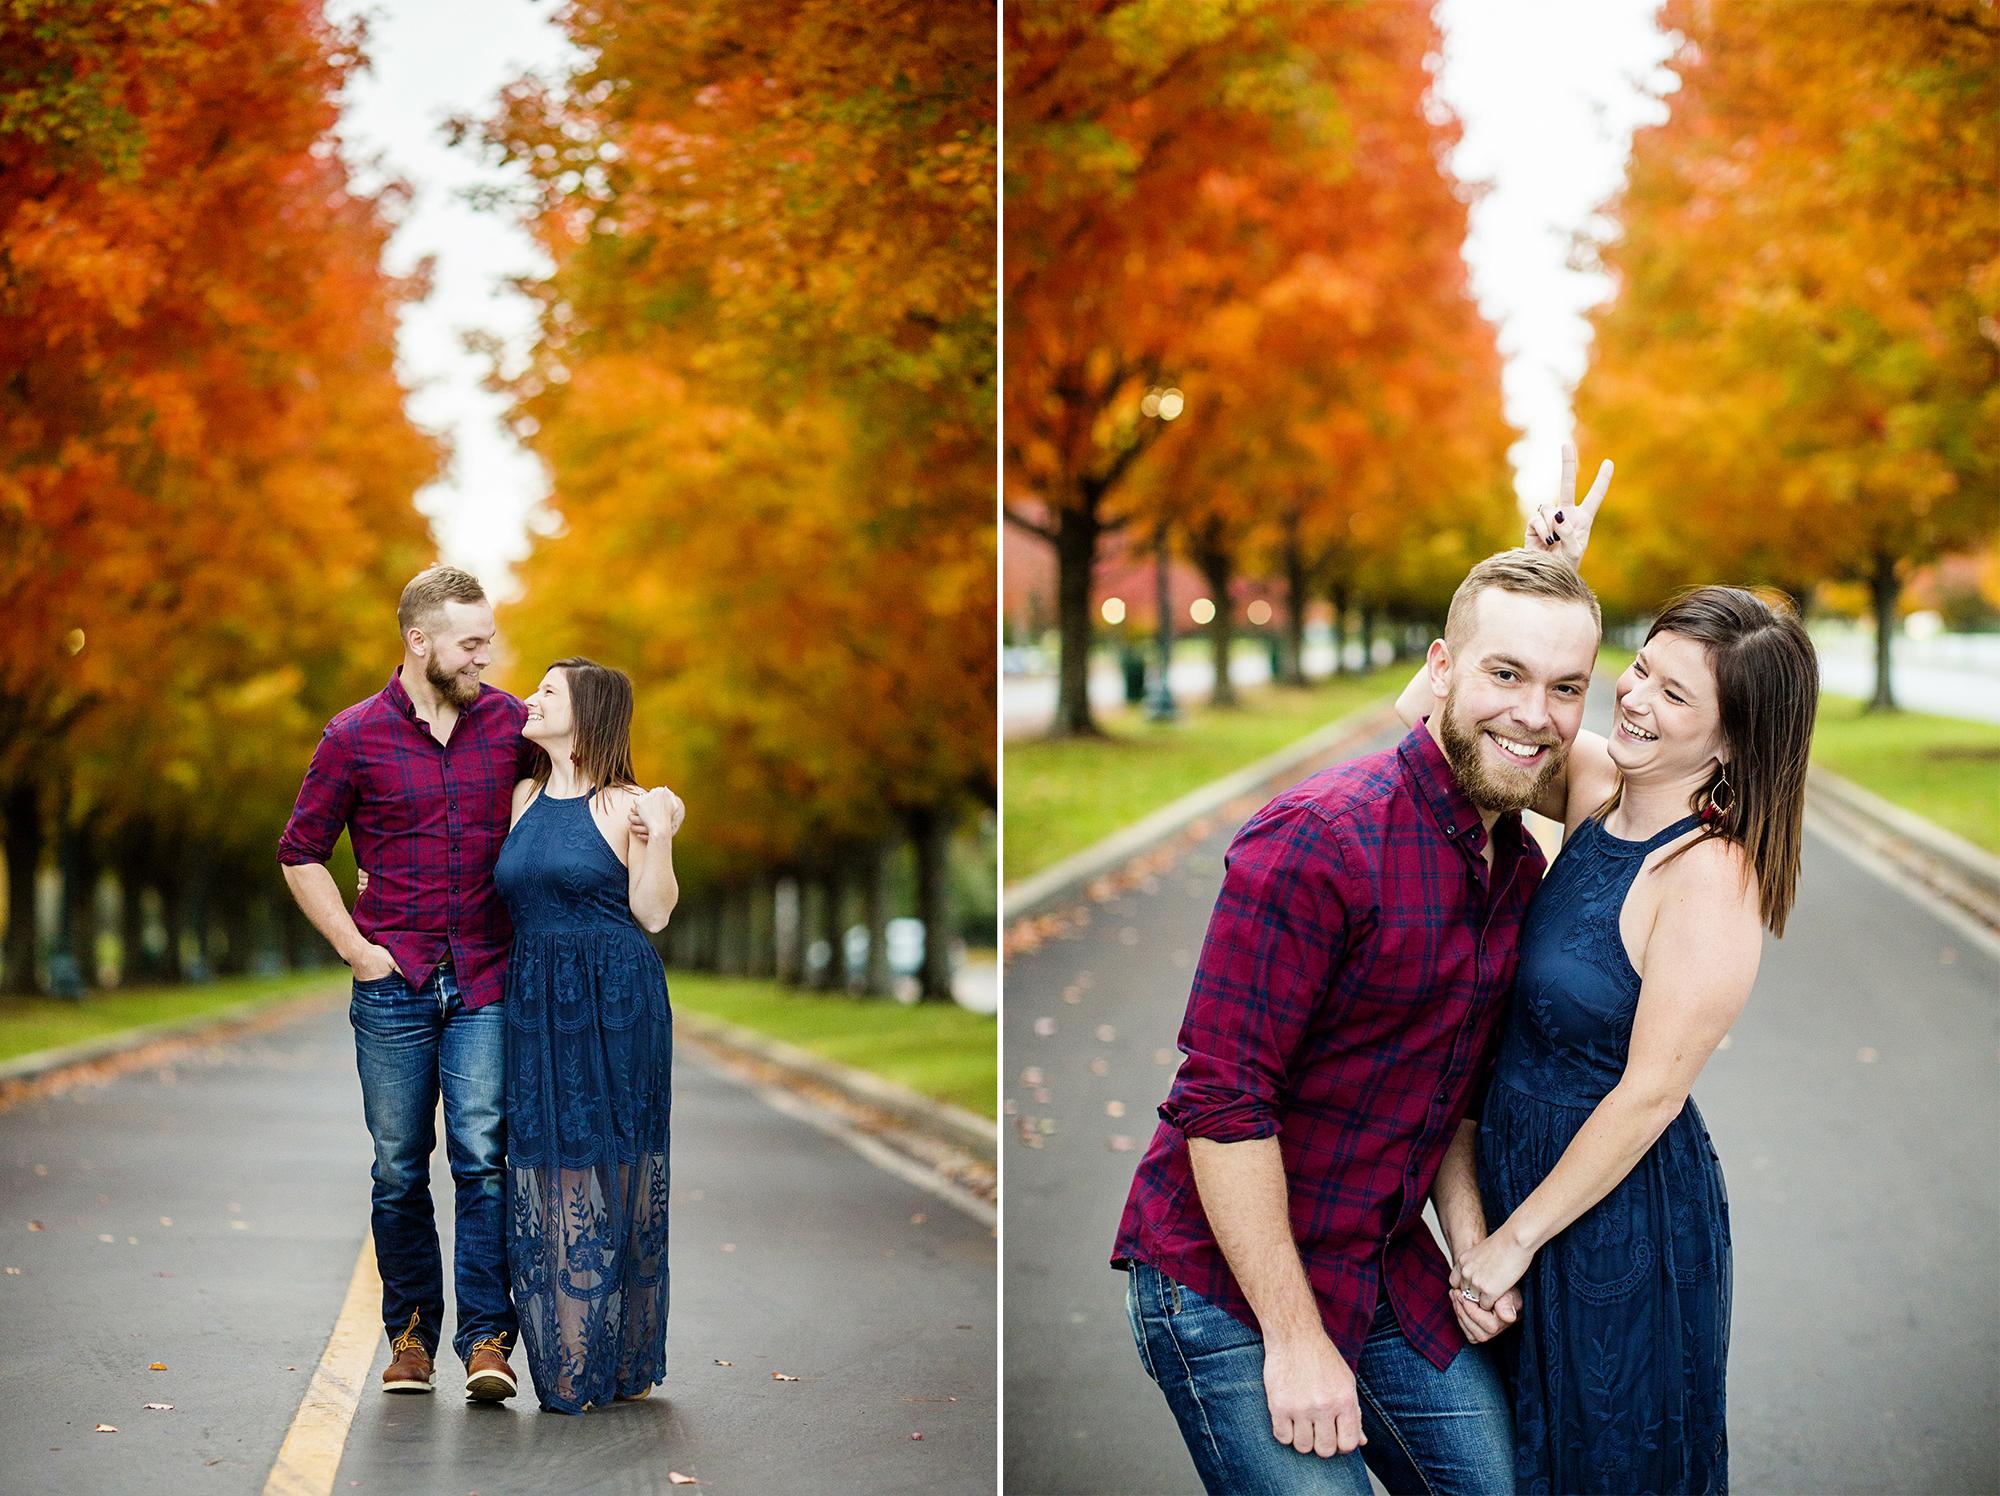 Seriously_Sabrina_Photography_Lexington_Kentucky_Country_Roads_Eckert_Boyd_Pisgah_Keeneland_Engagement_SethRachel_30.jpg